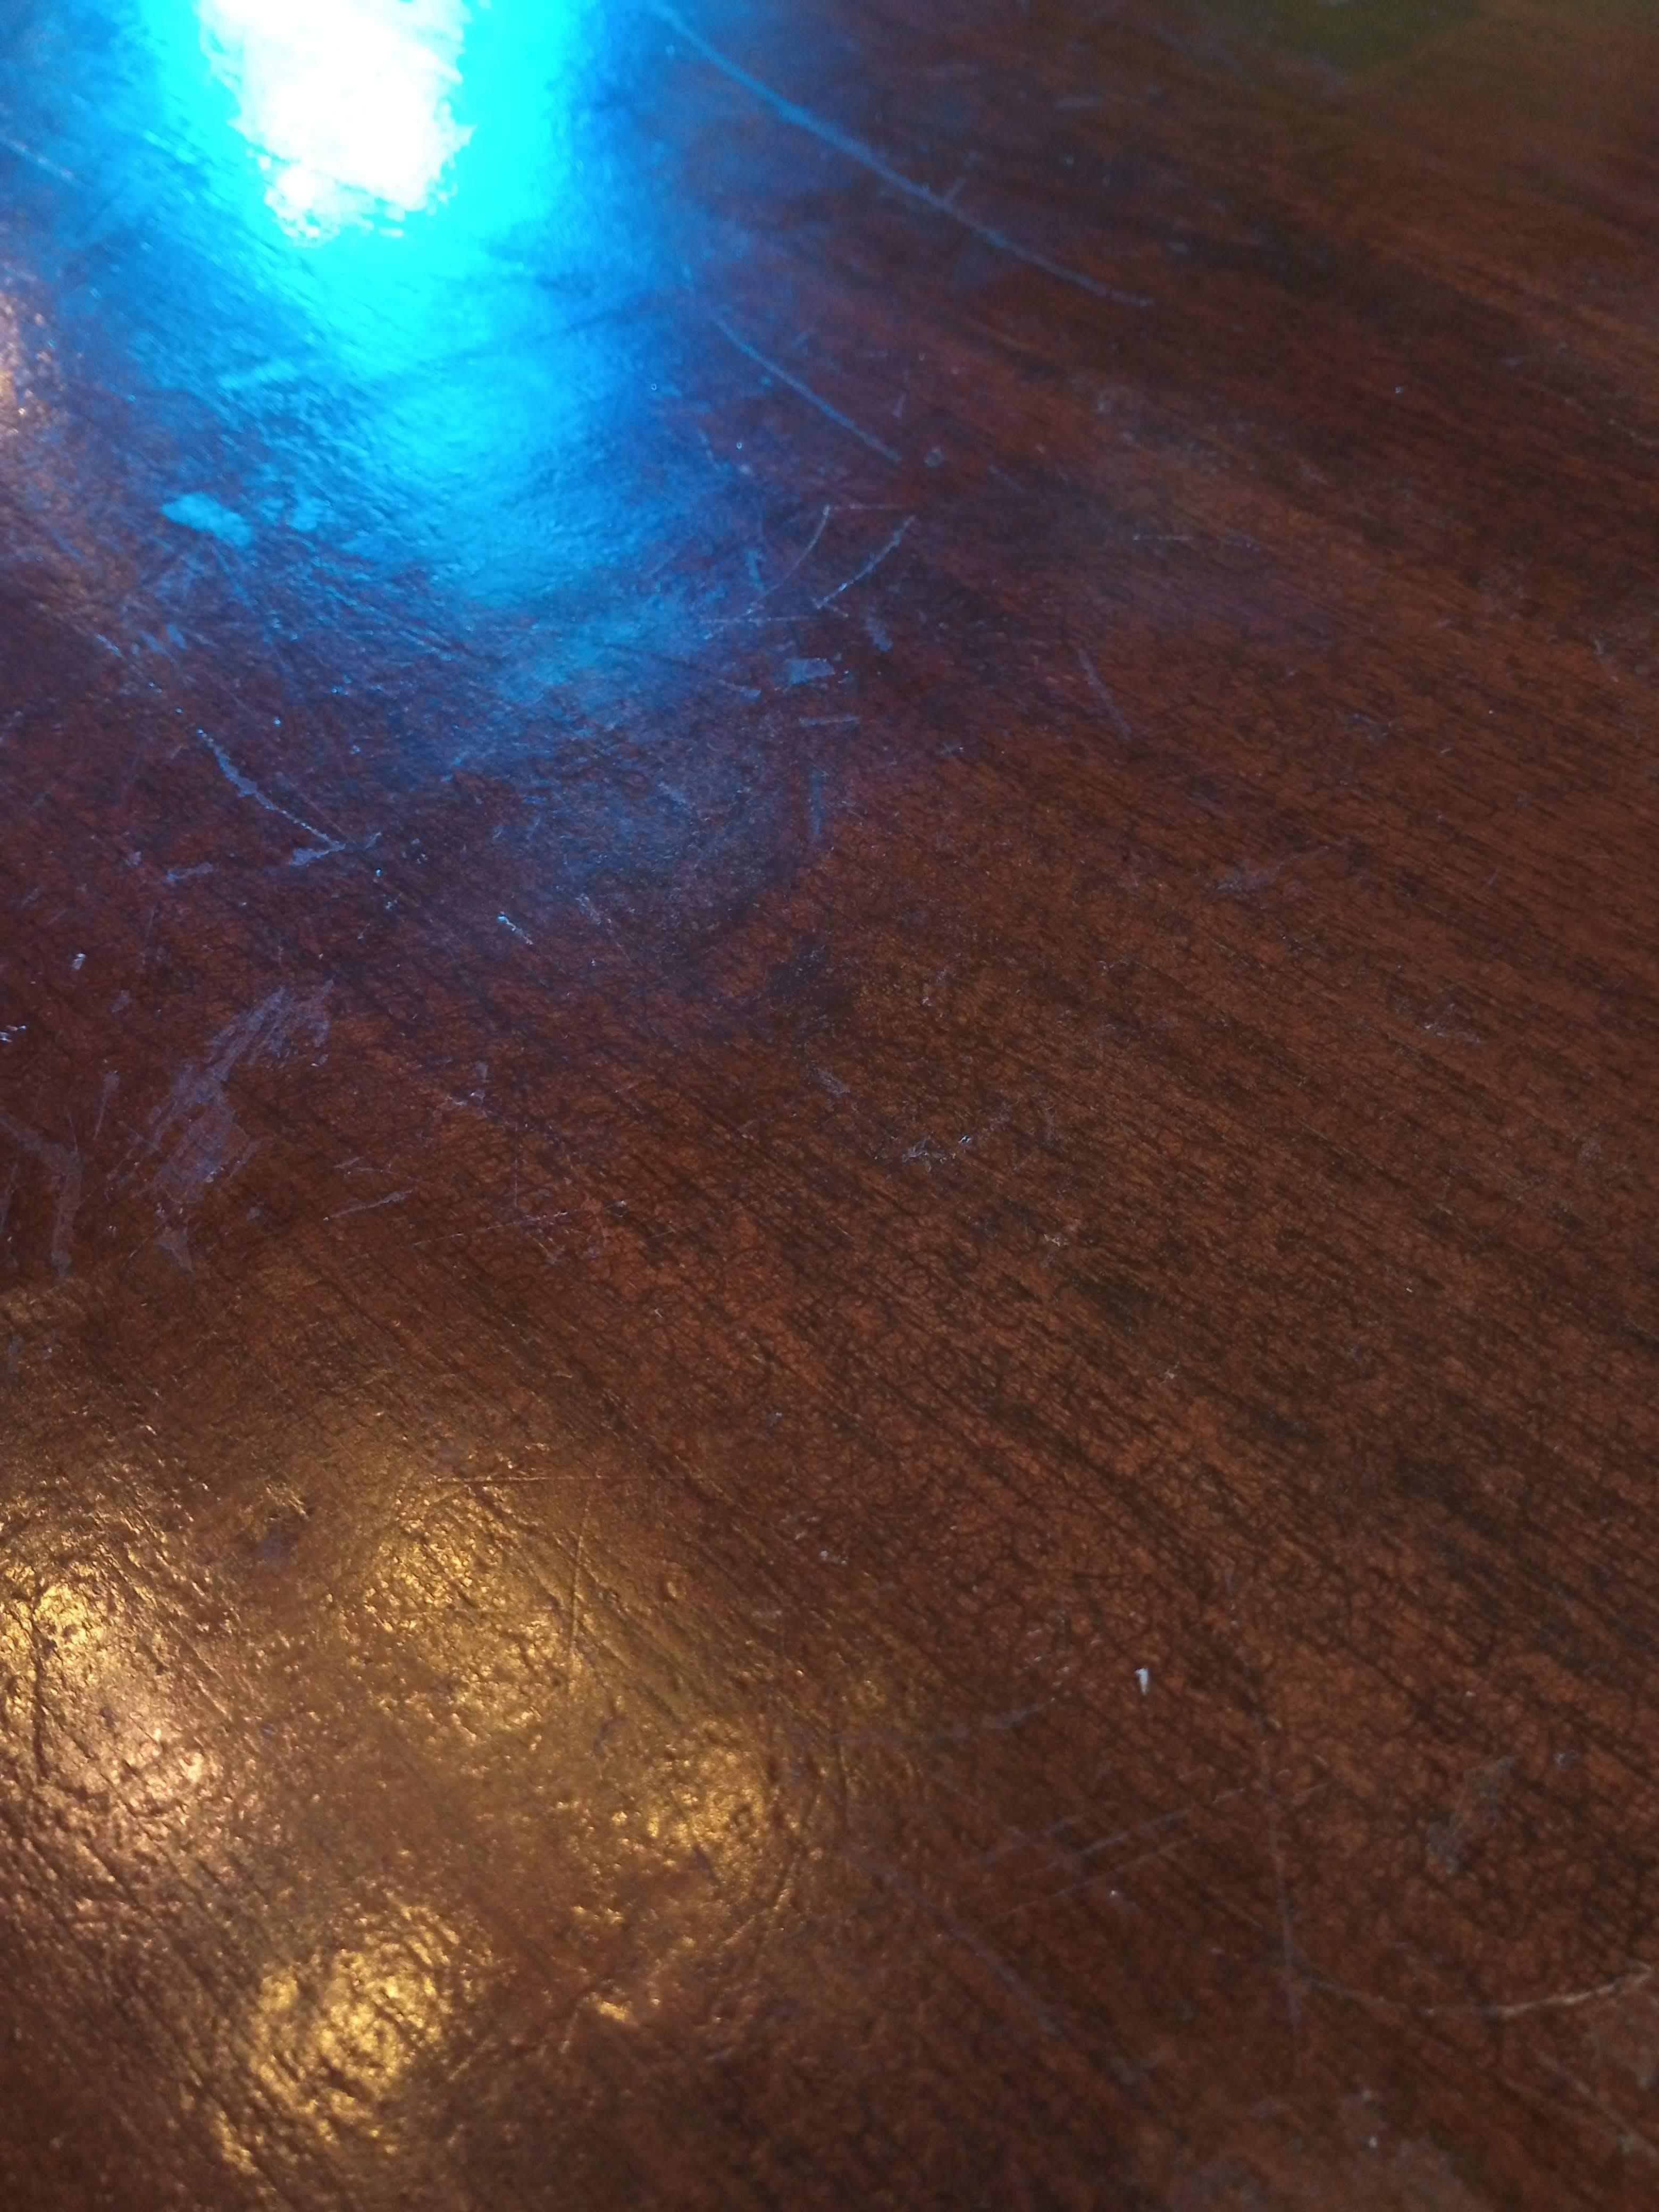 Free stock photo of blue, brown, café, dark